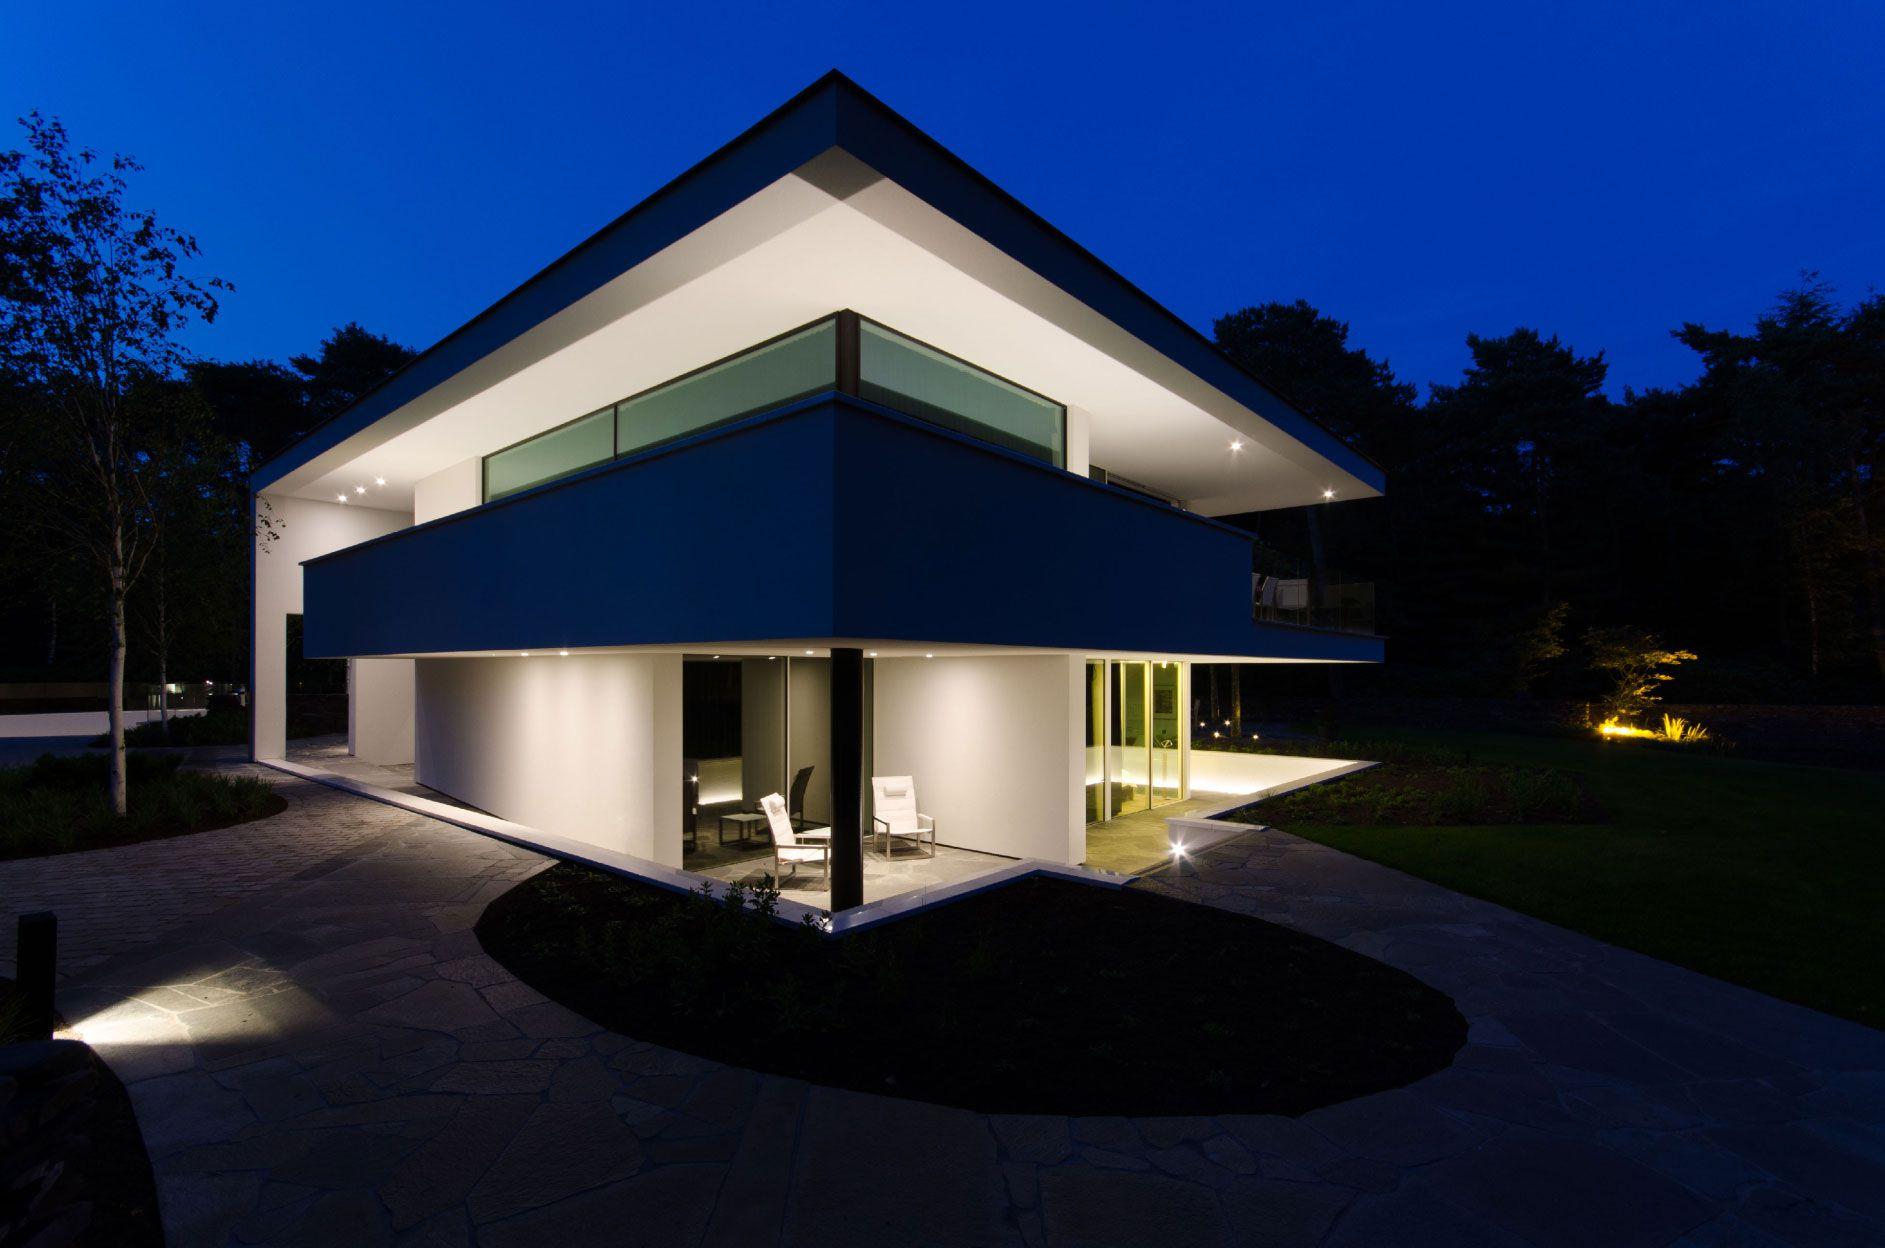 Ultramodern NoordBrabant House by DPL Europe  CAANdesign  Architecture and home design blog